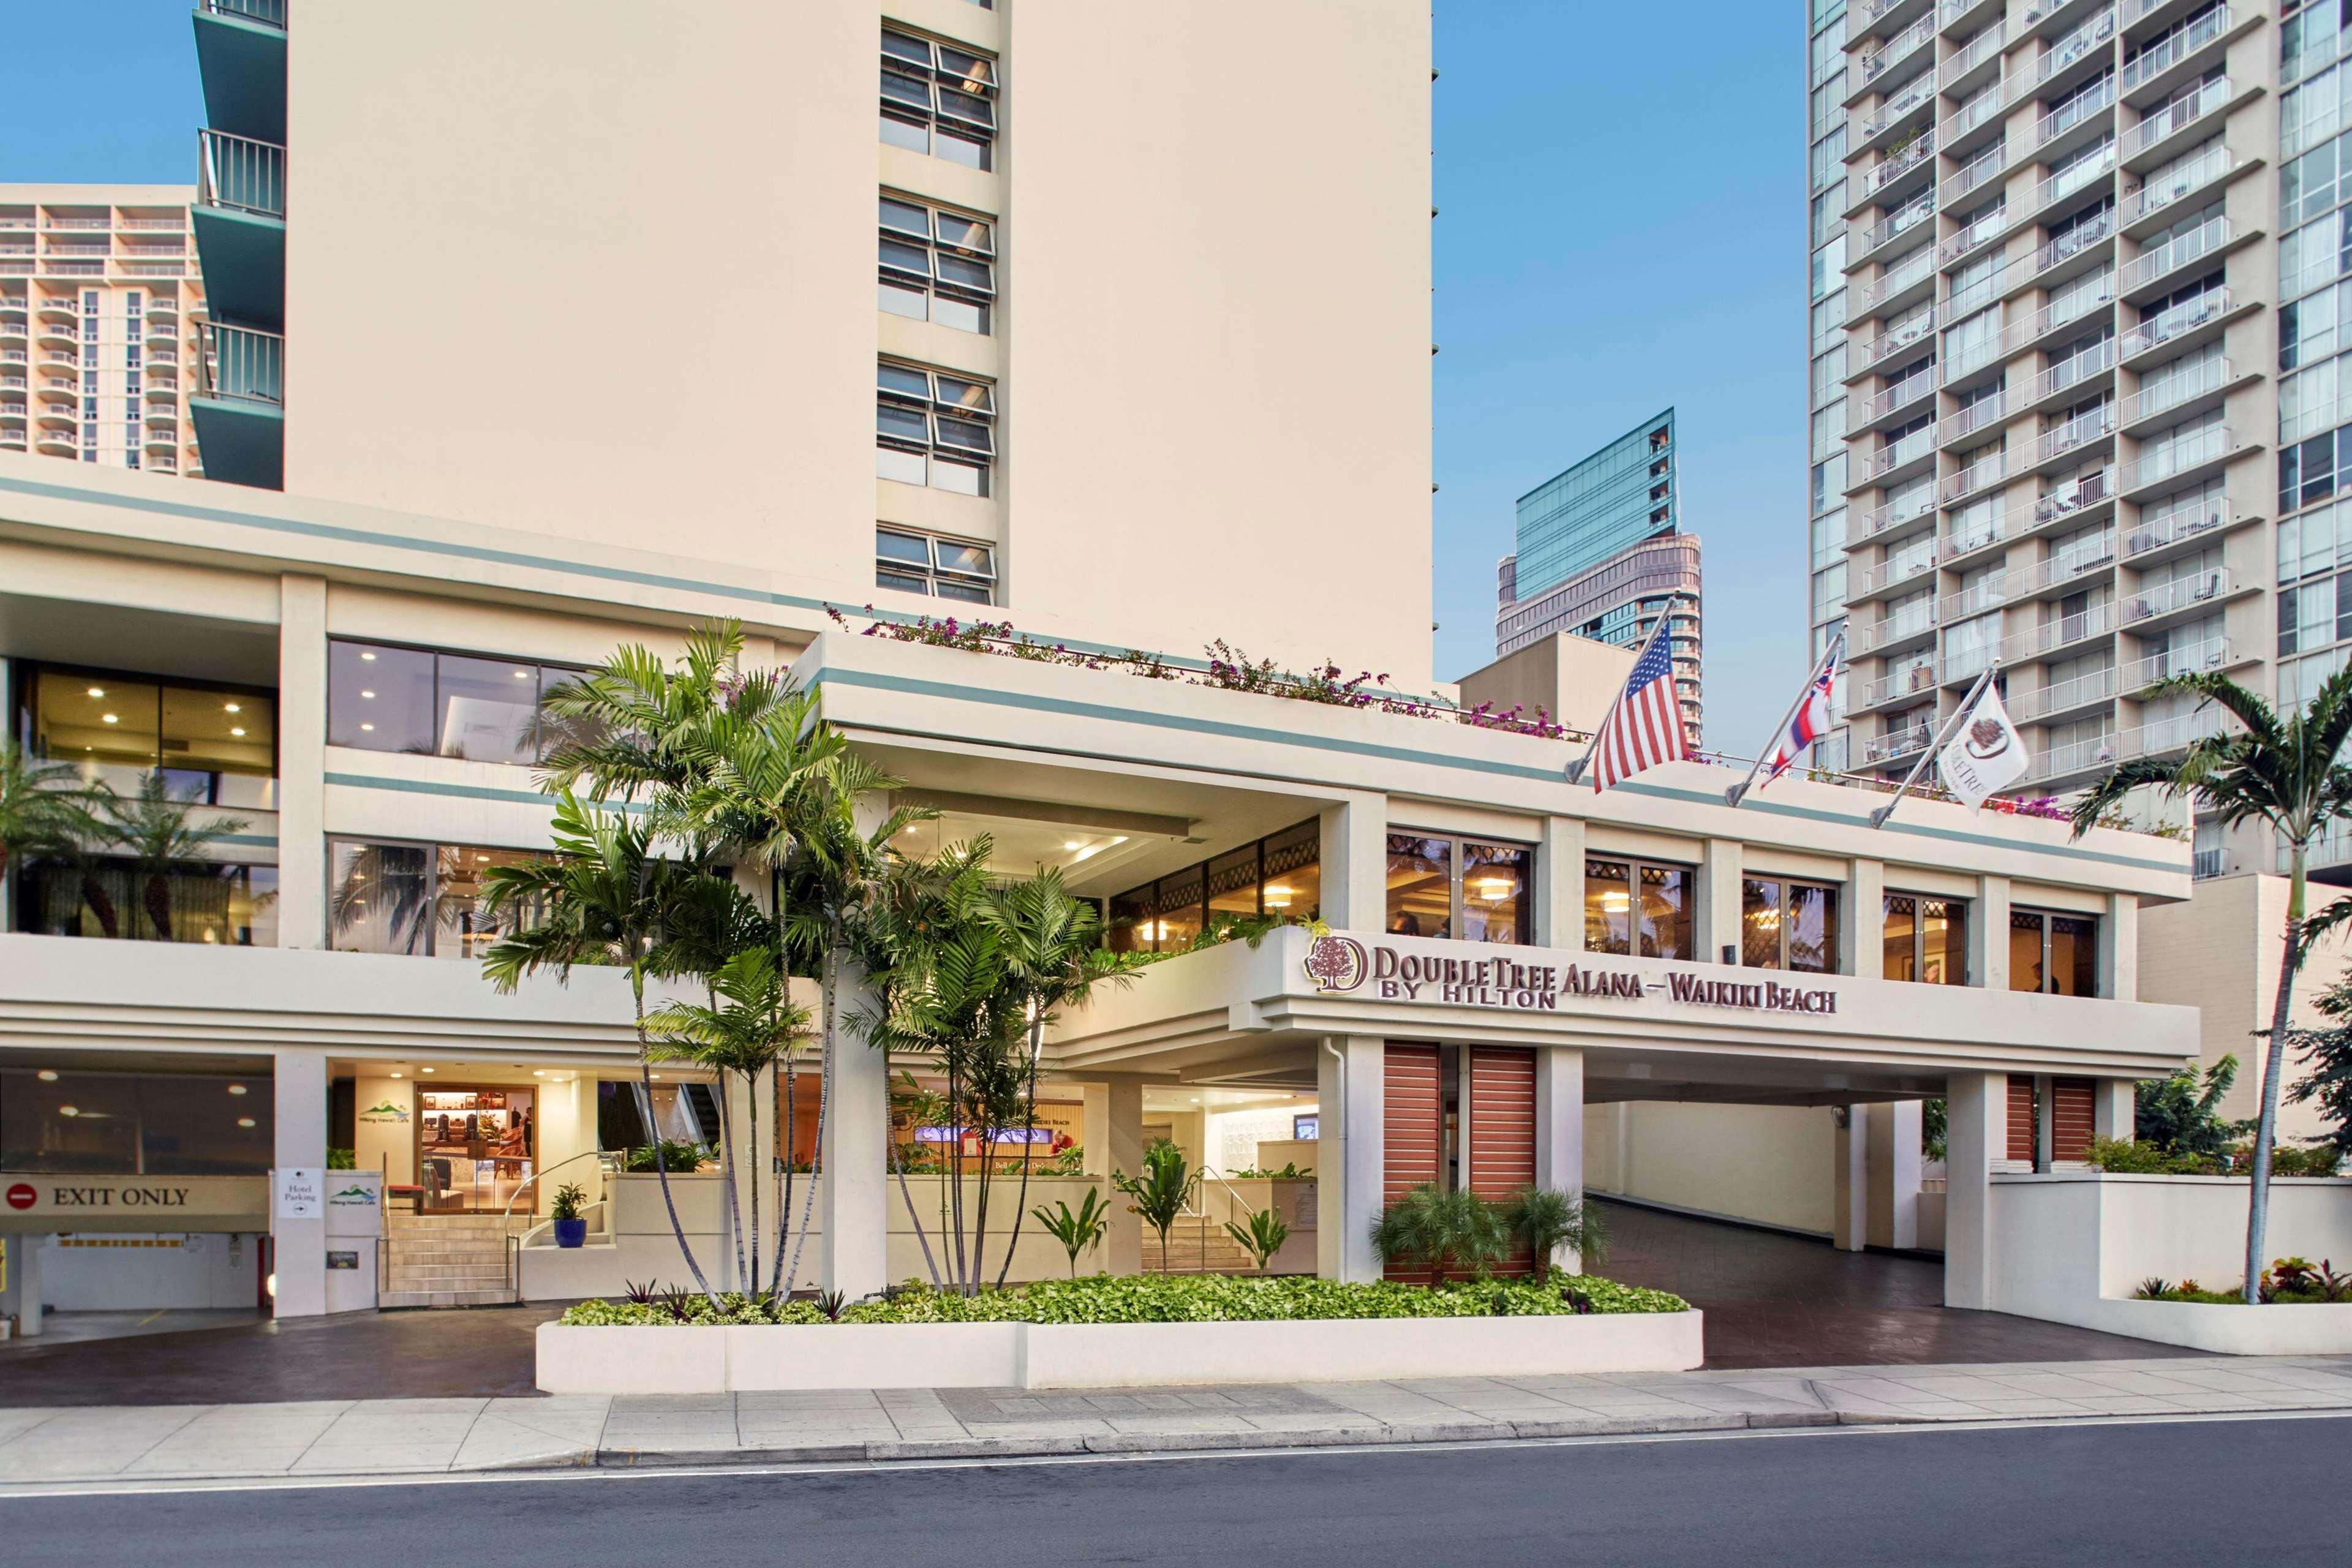 DoubleTree by Hilton Hotel Alana - Waikiki Beach image 26